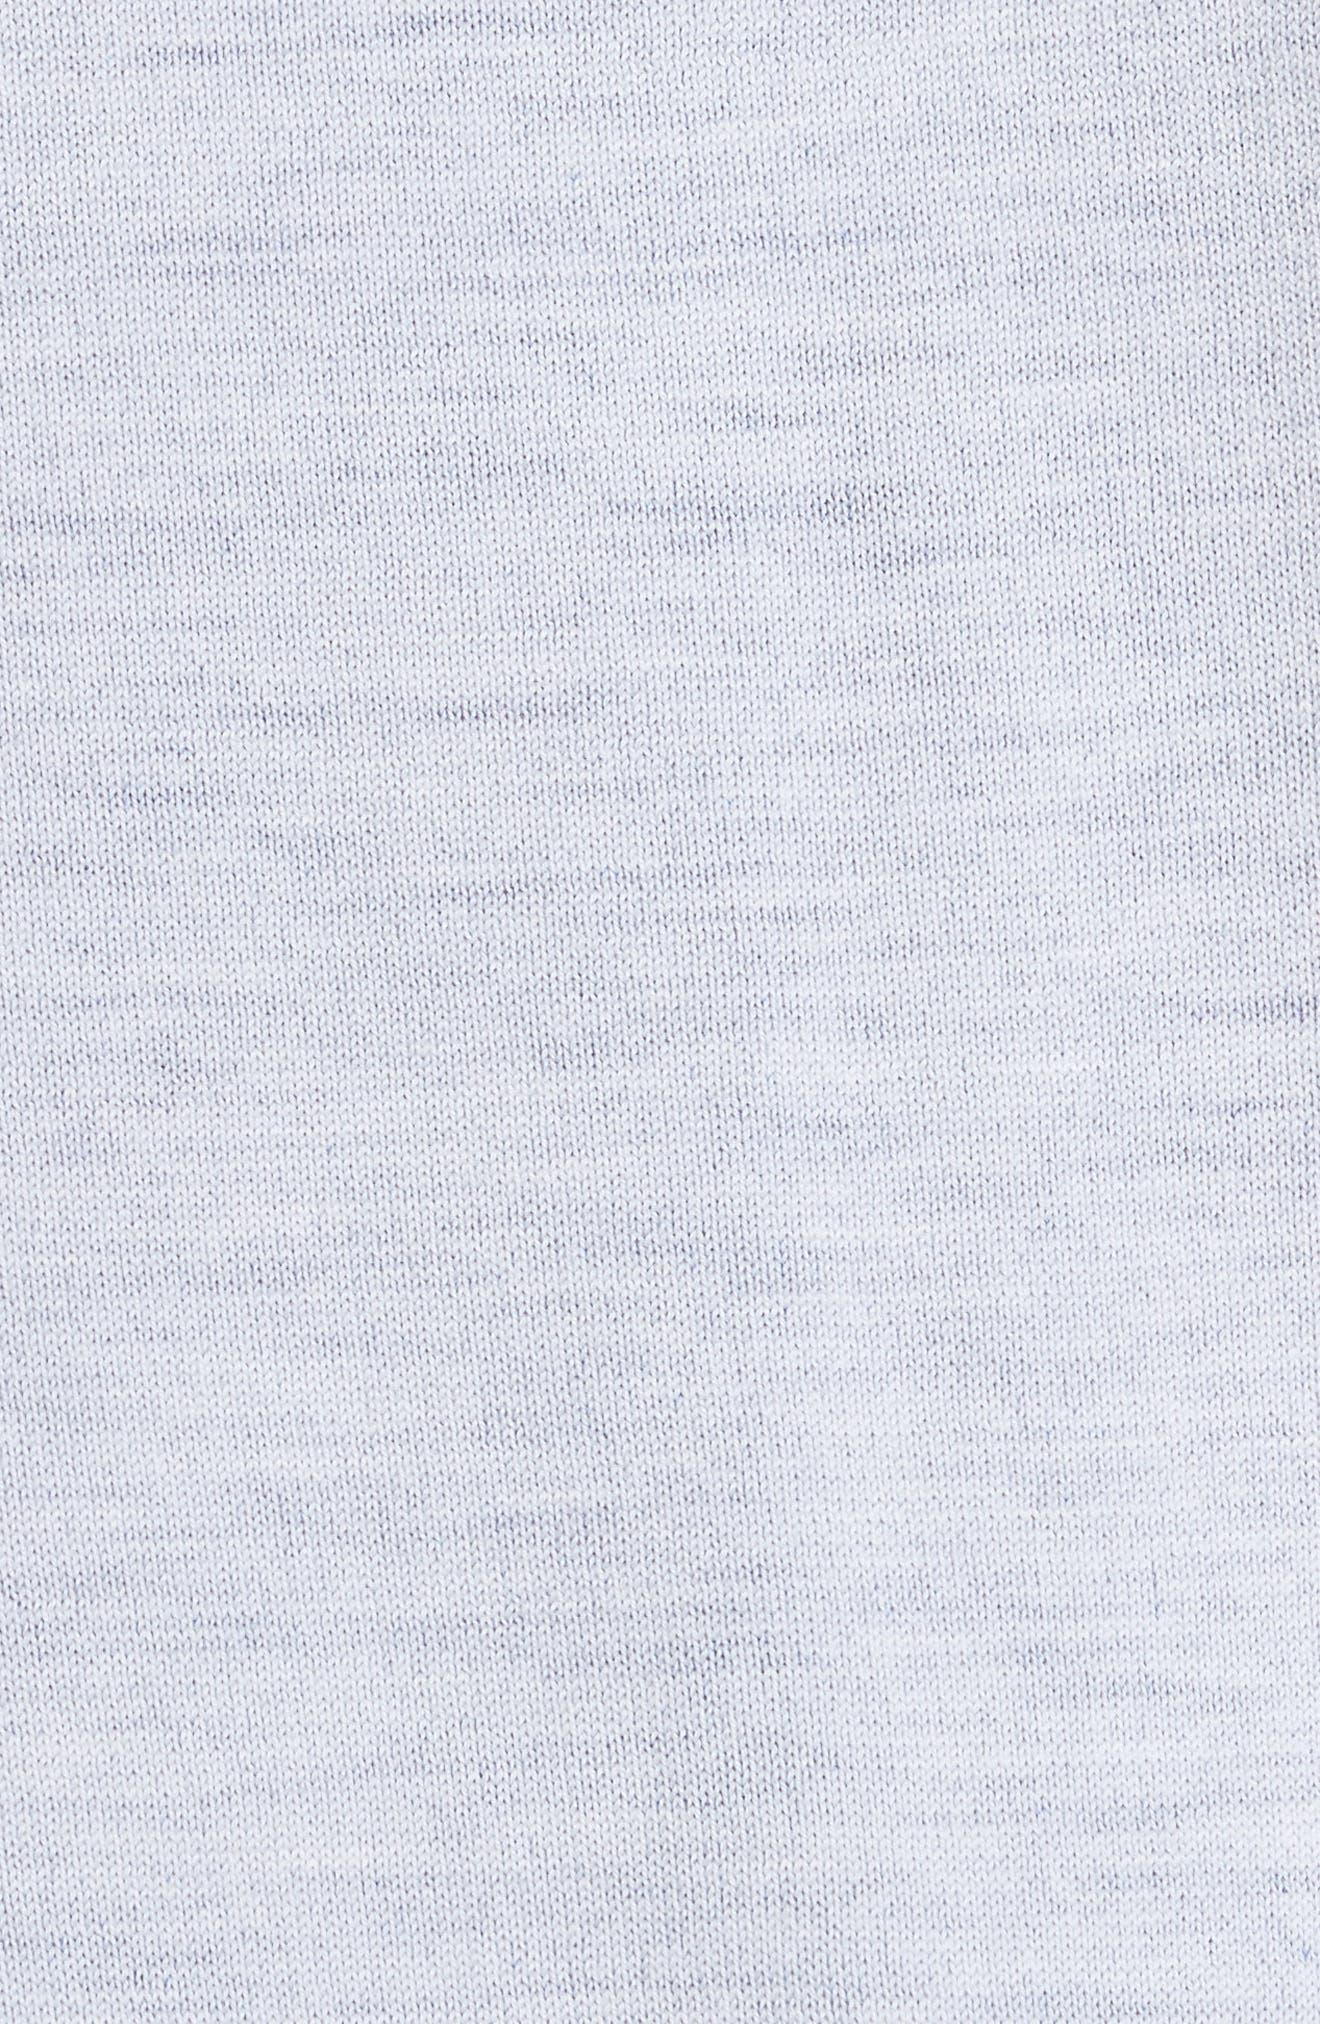 Florence V-Neck Cardigan,                             Alternate thumbnail 5, color,                             Off White/ Blue